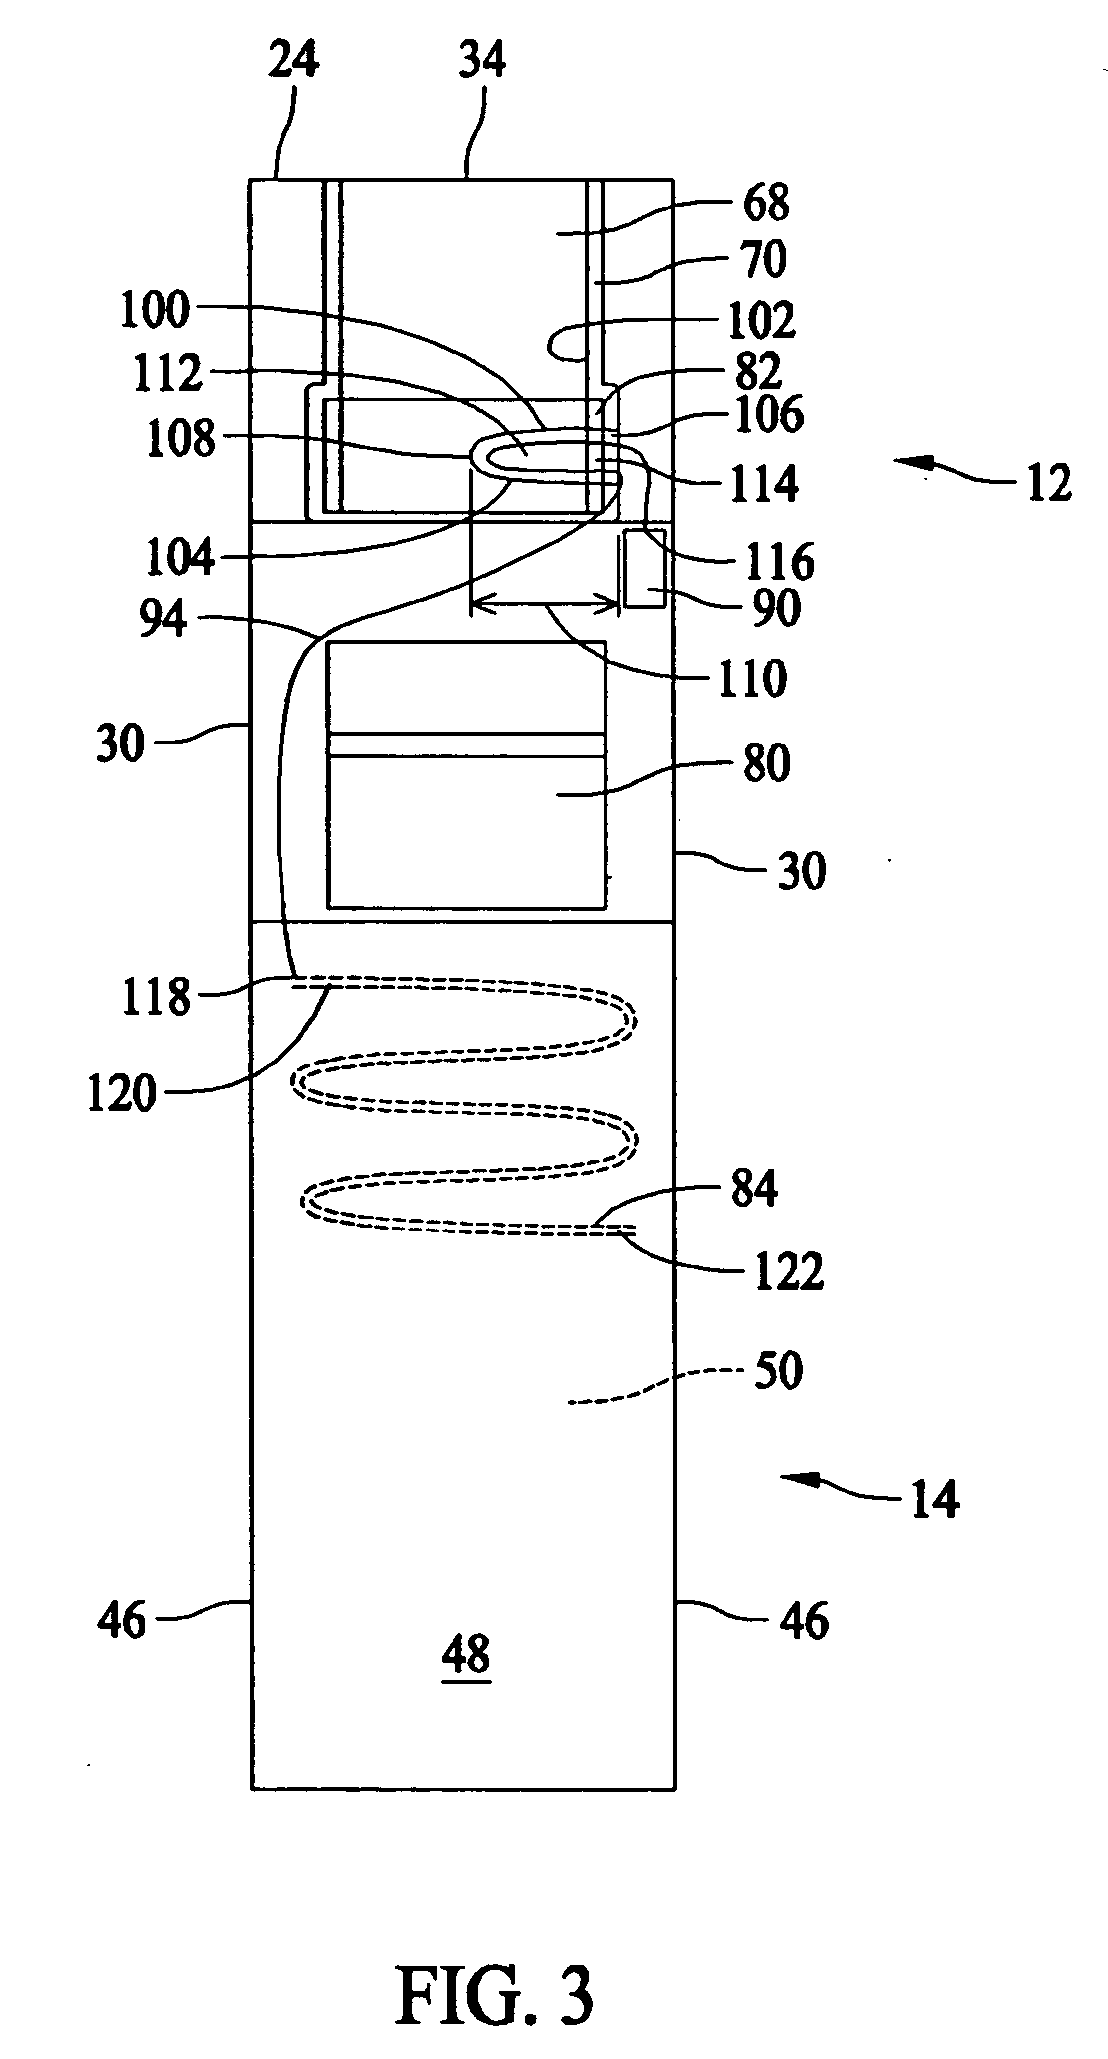 Mahindra 6000 Wiring Diagram Honda F550 Wiring Diagram For 2008 03 ...